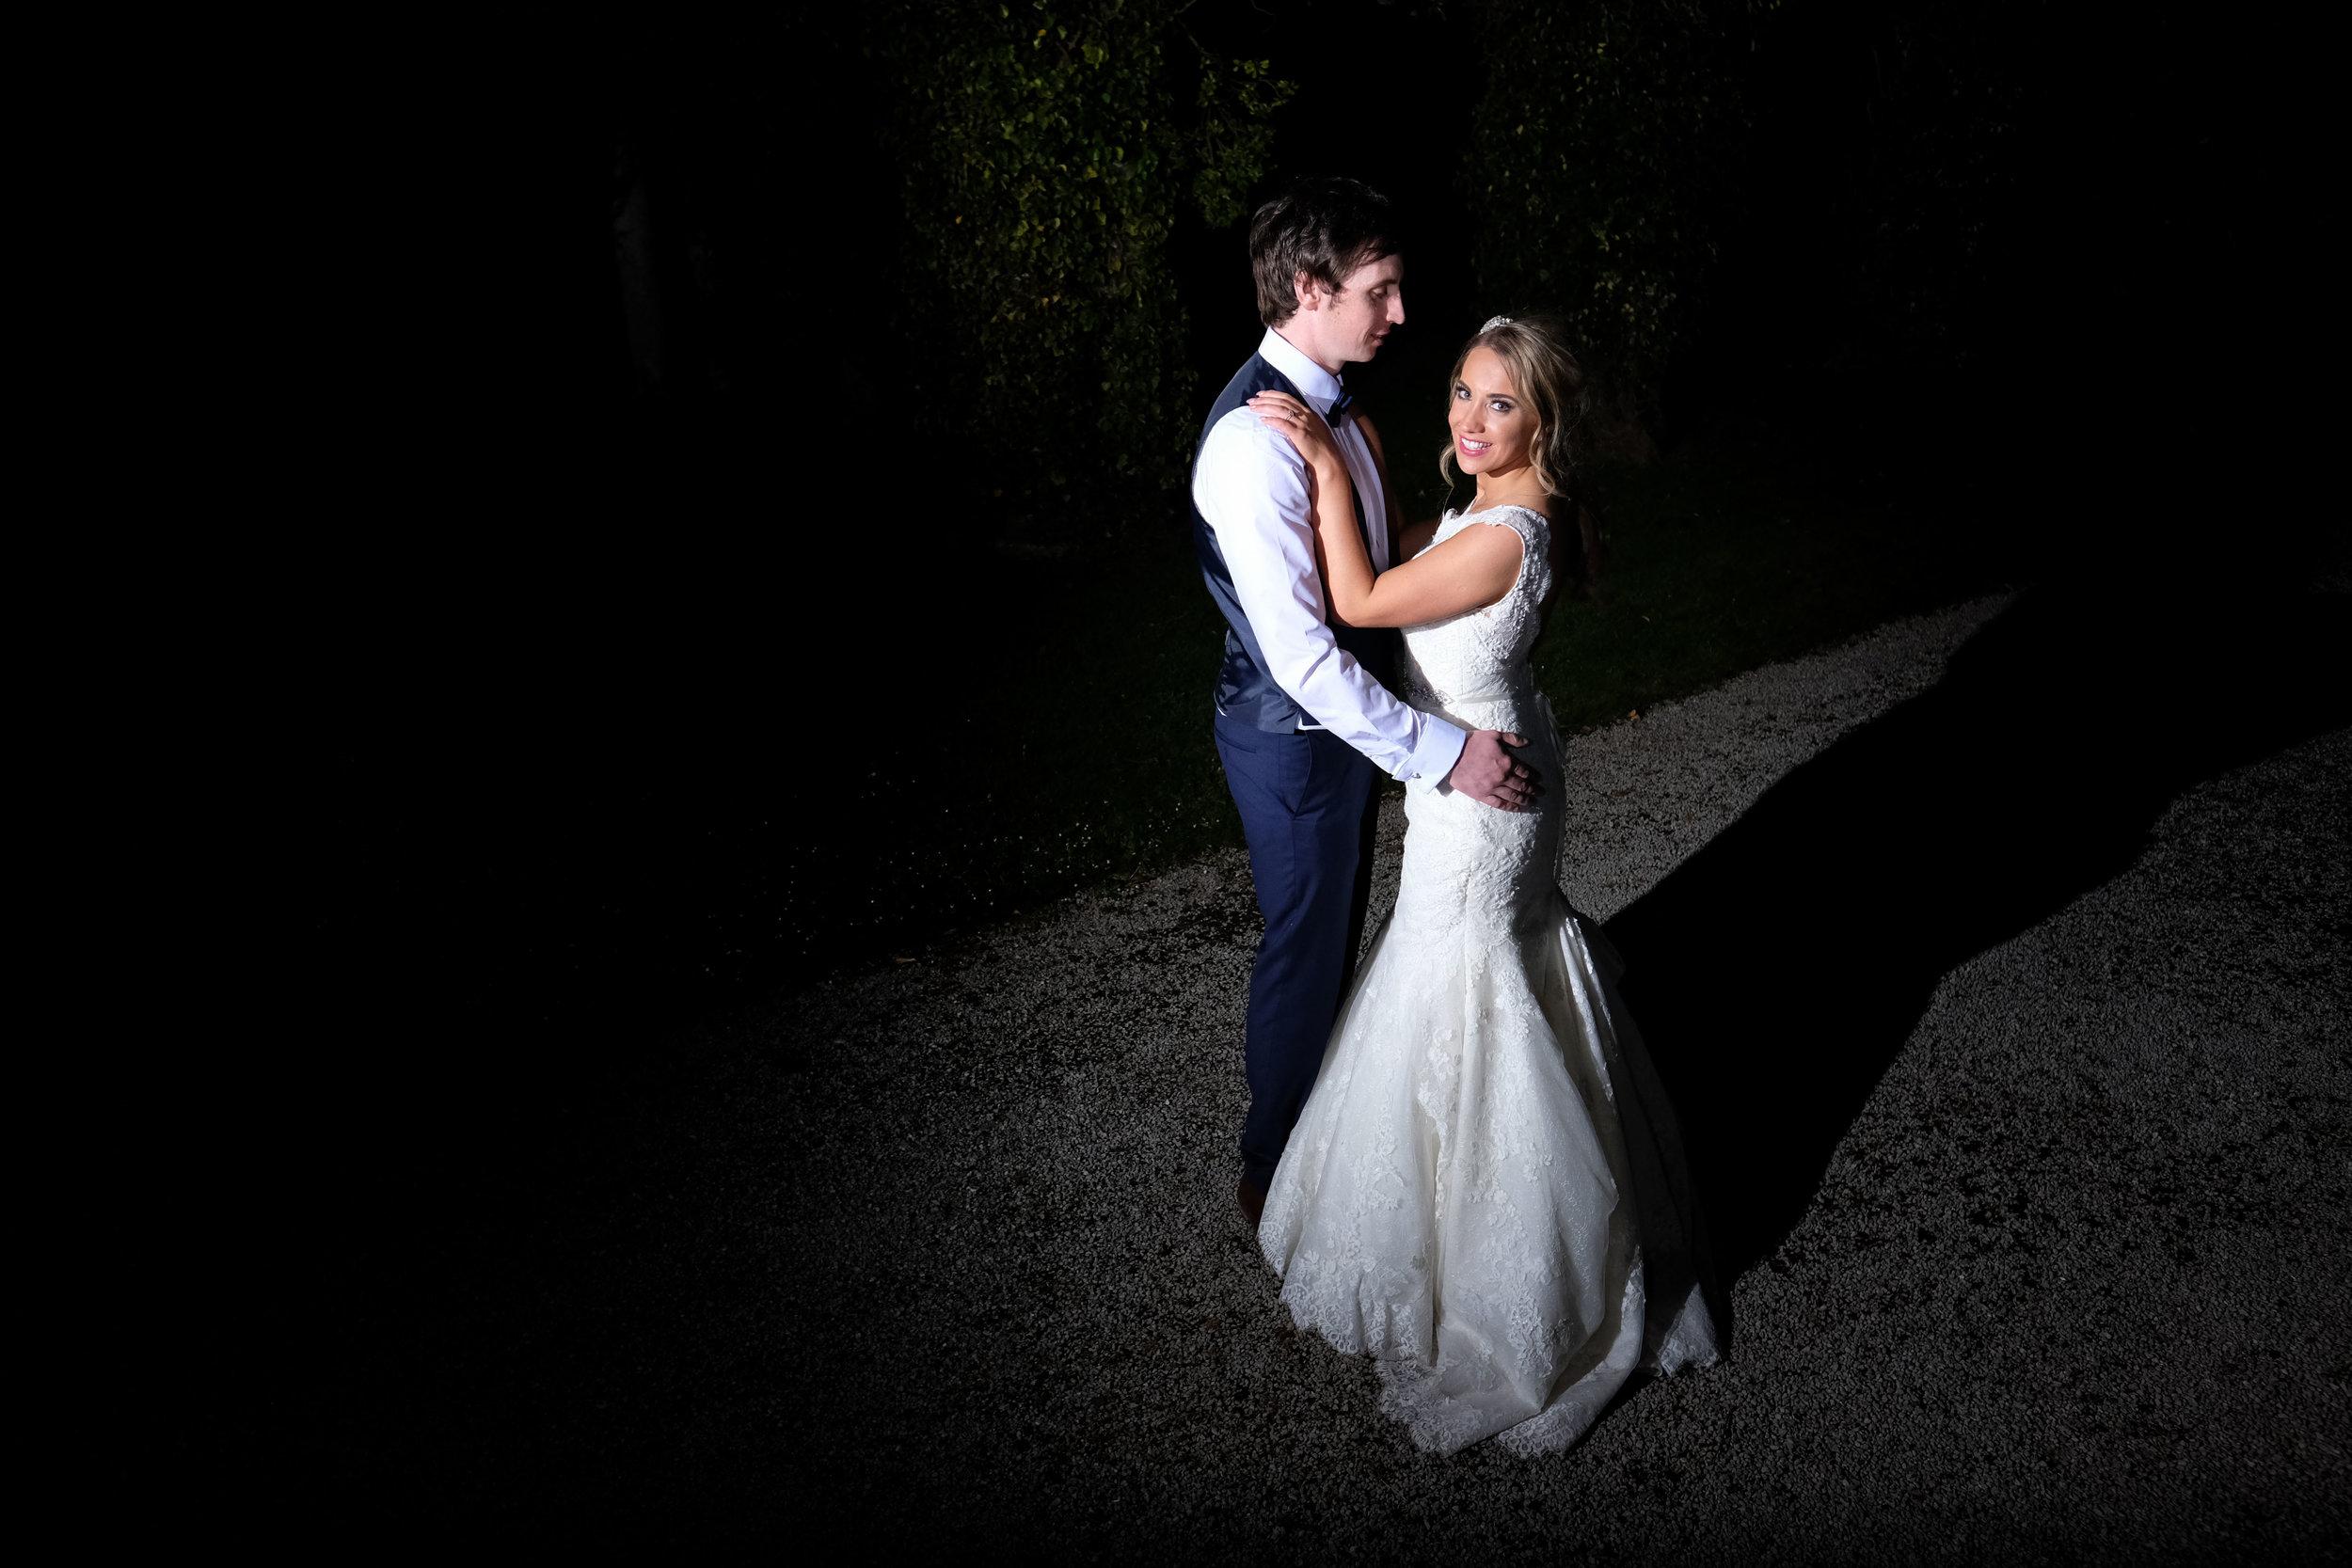 Thornton manor wedding photography cheshire wedding photographer liverpool manchester warrington chester wirral wedding BLOG (107 of 108).jpg